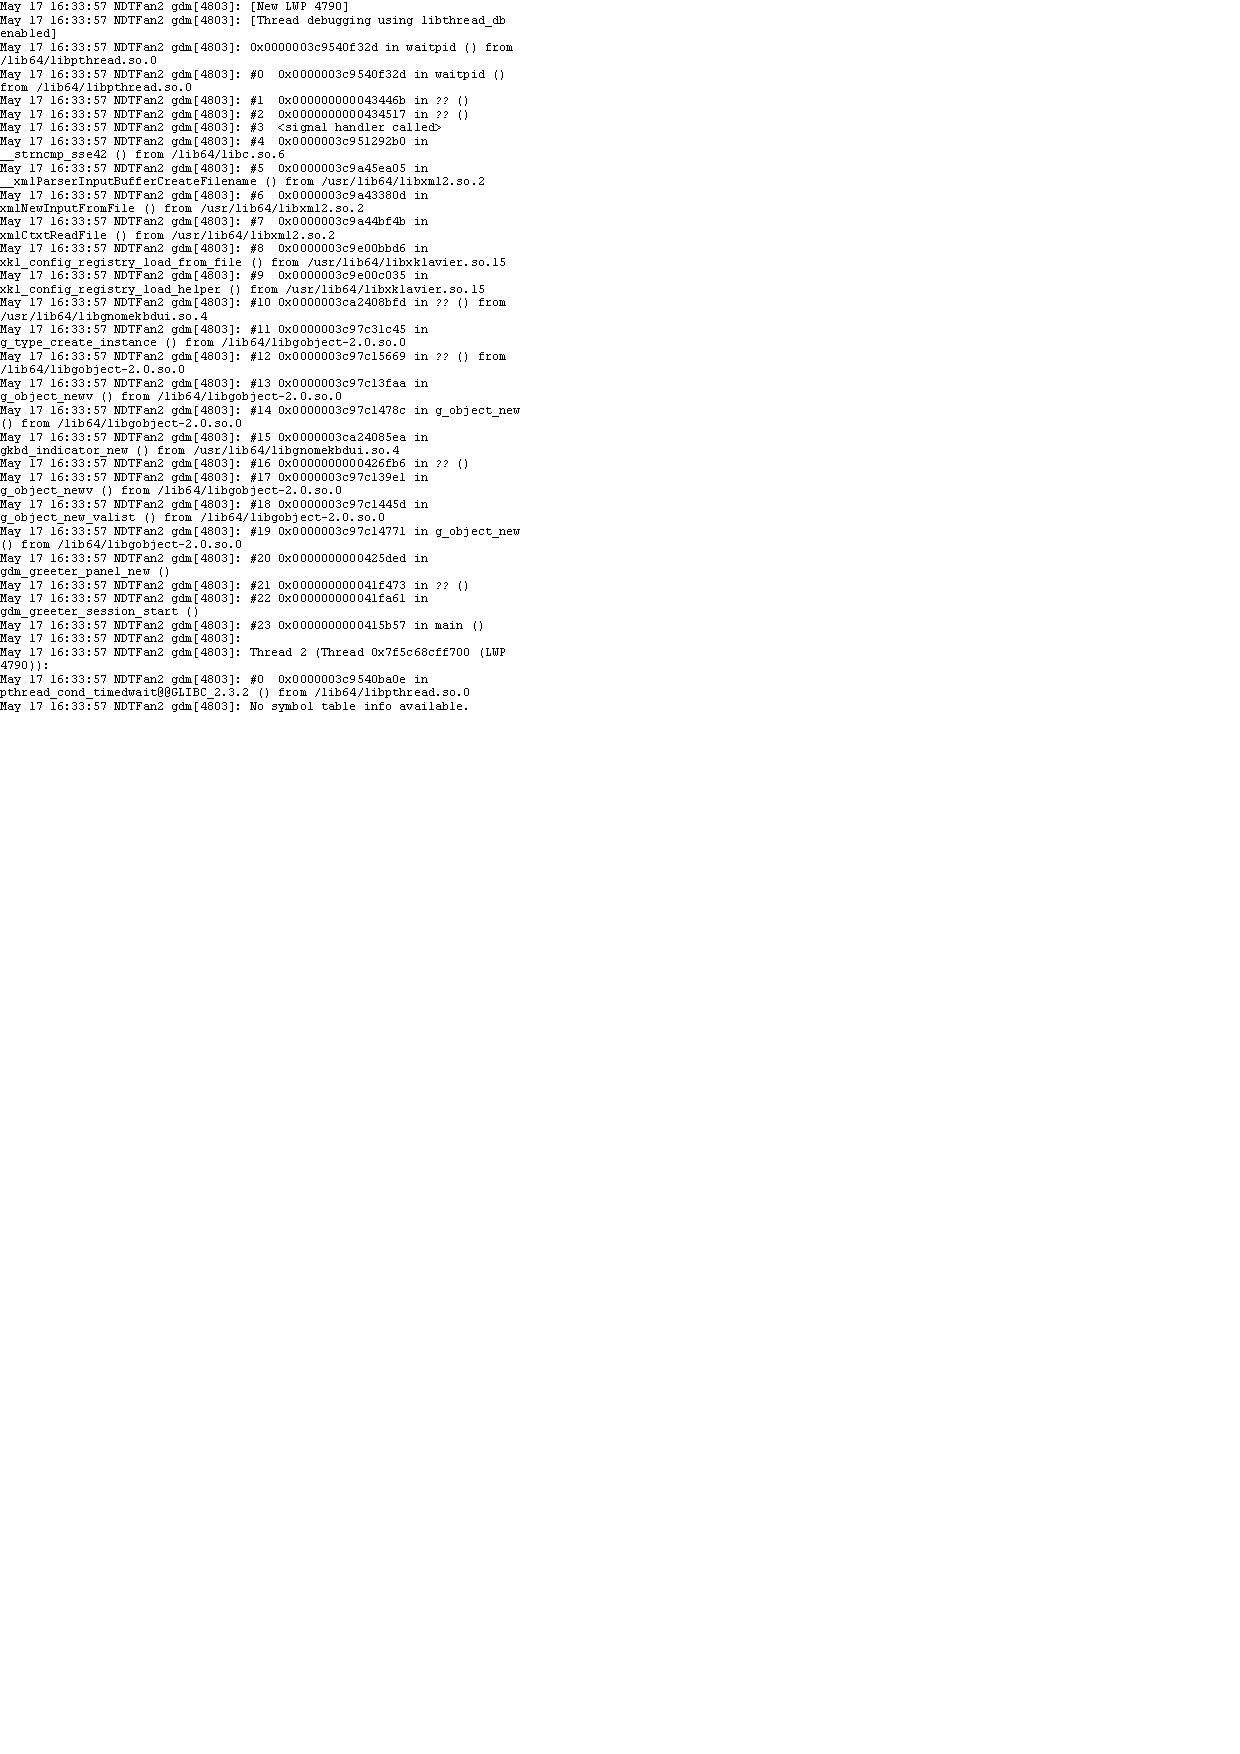 GDM Login prompt not showing ( Redhat Linux Workst